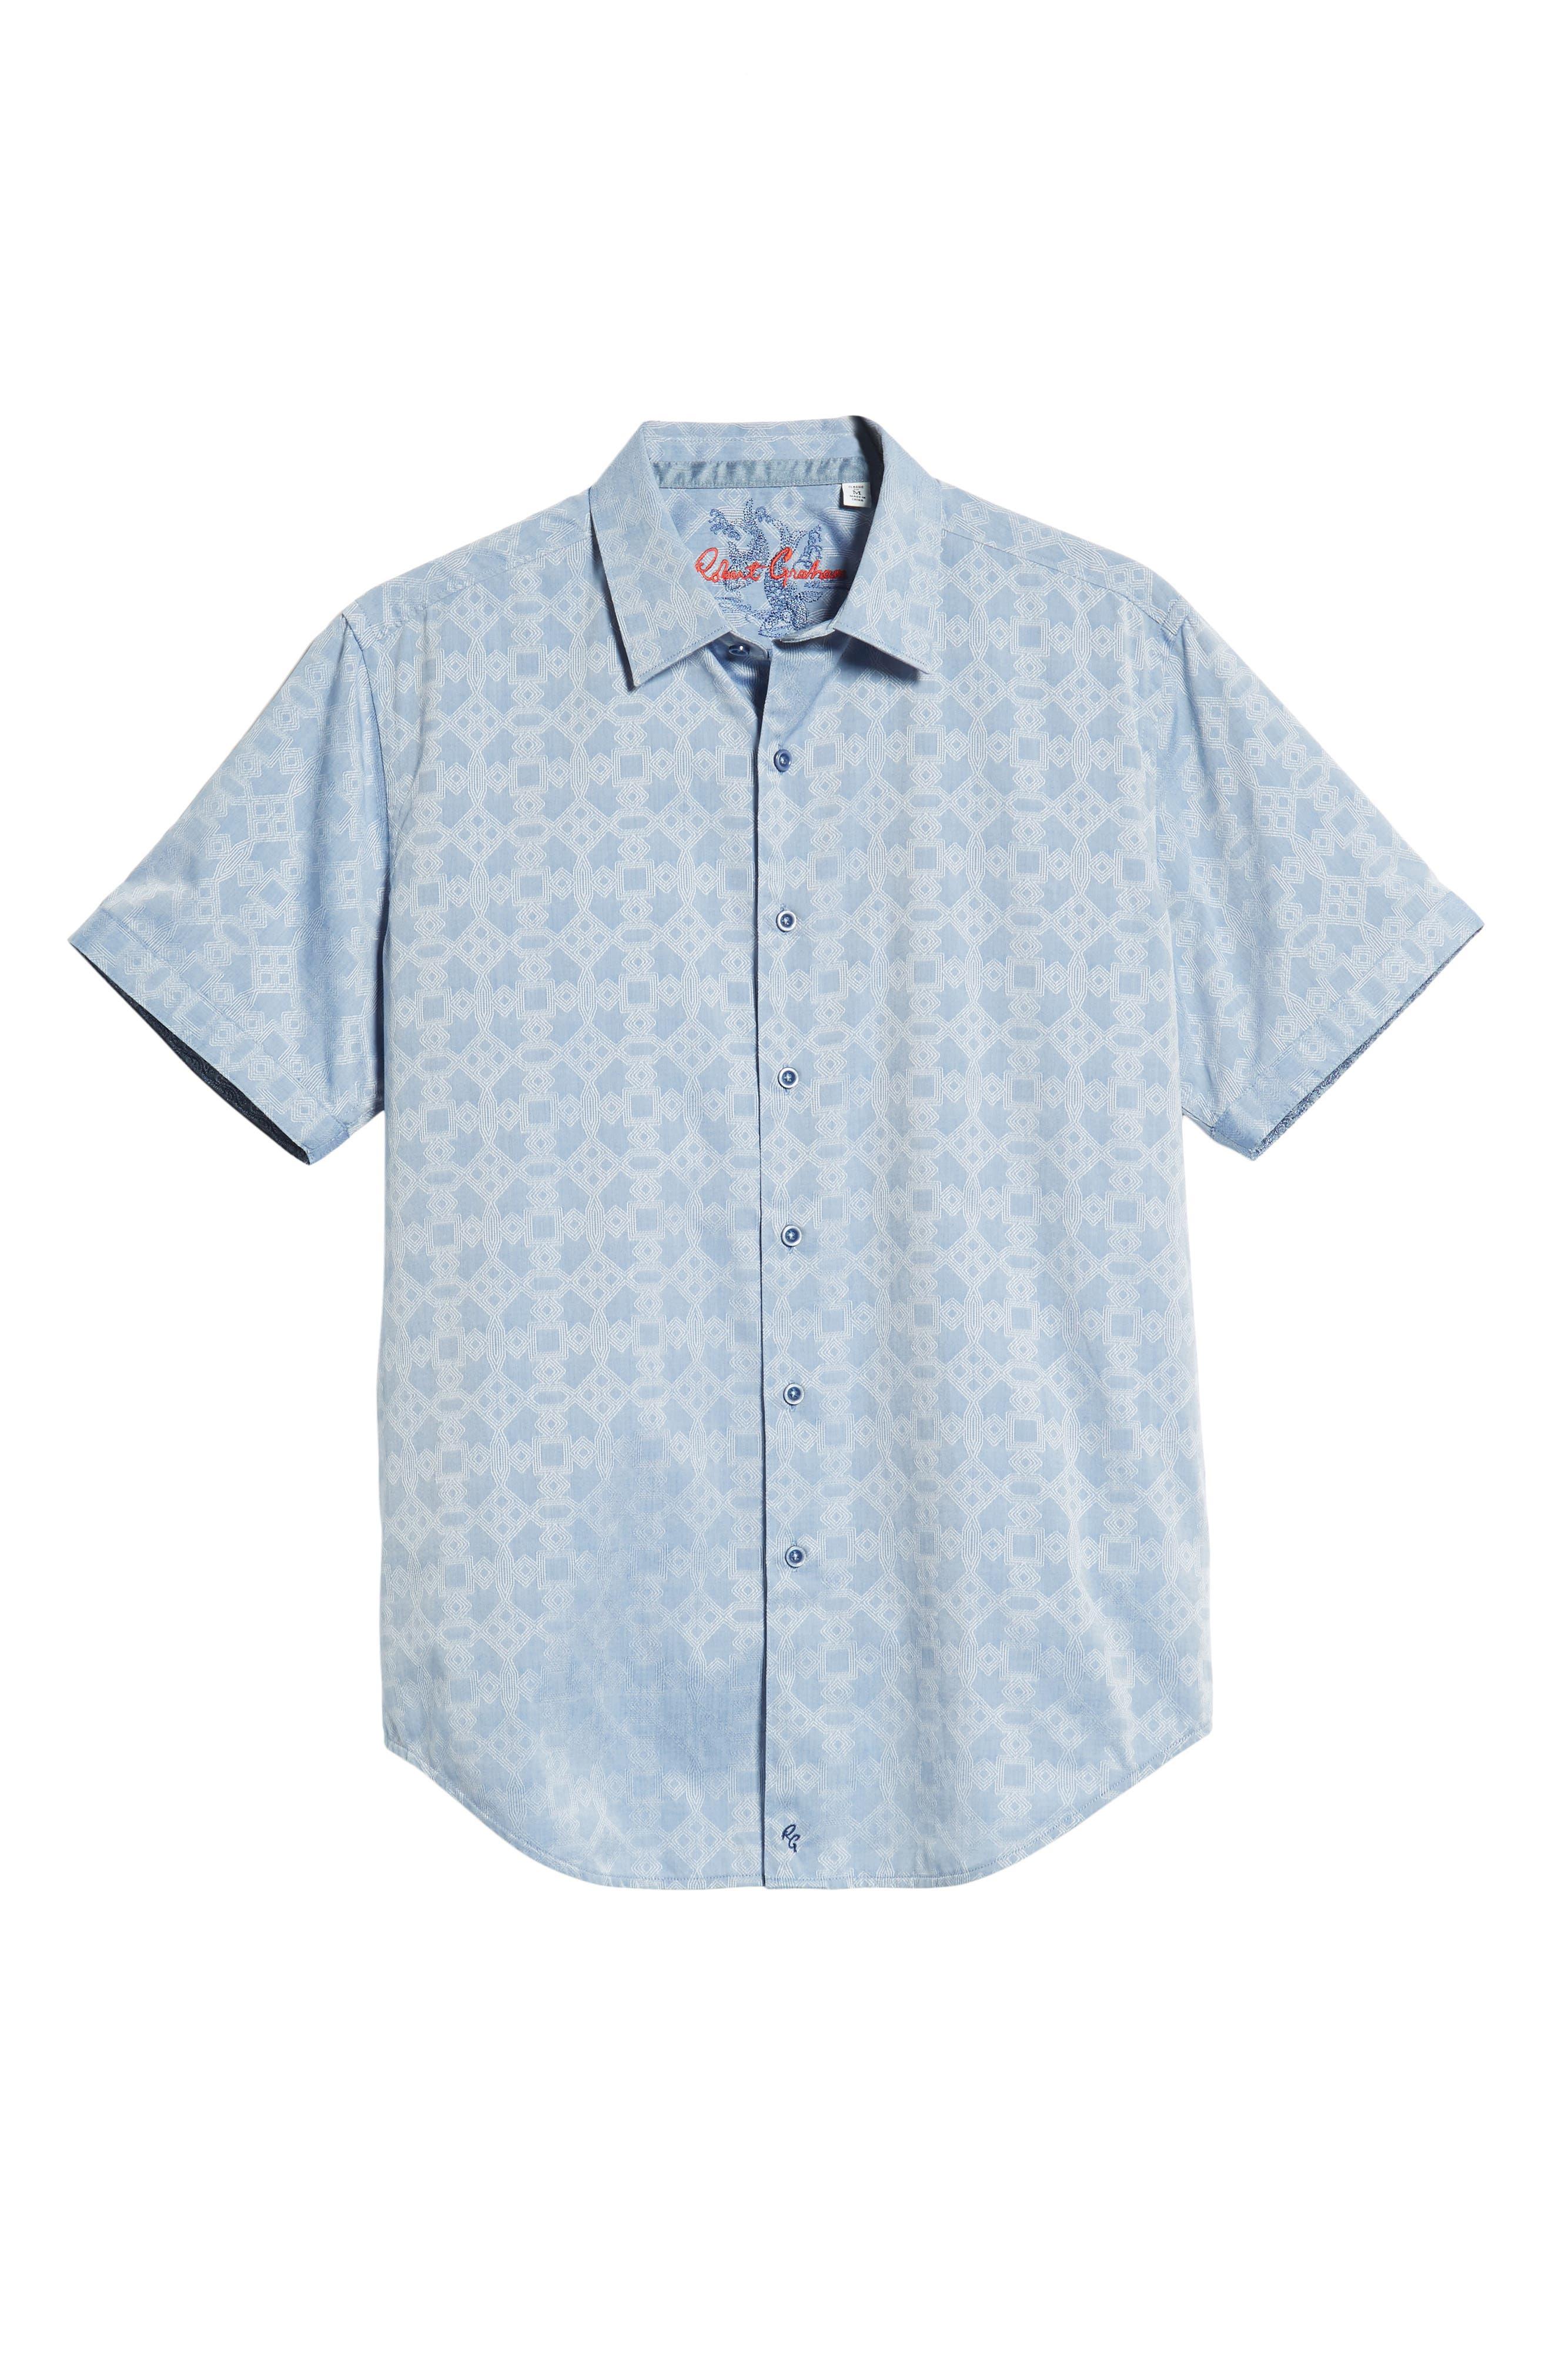 Maya Bay Classic Fit Jacquard Sport Shirt,                             Main thumbnail 1, color,                             Blue